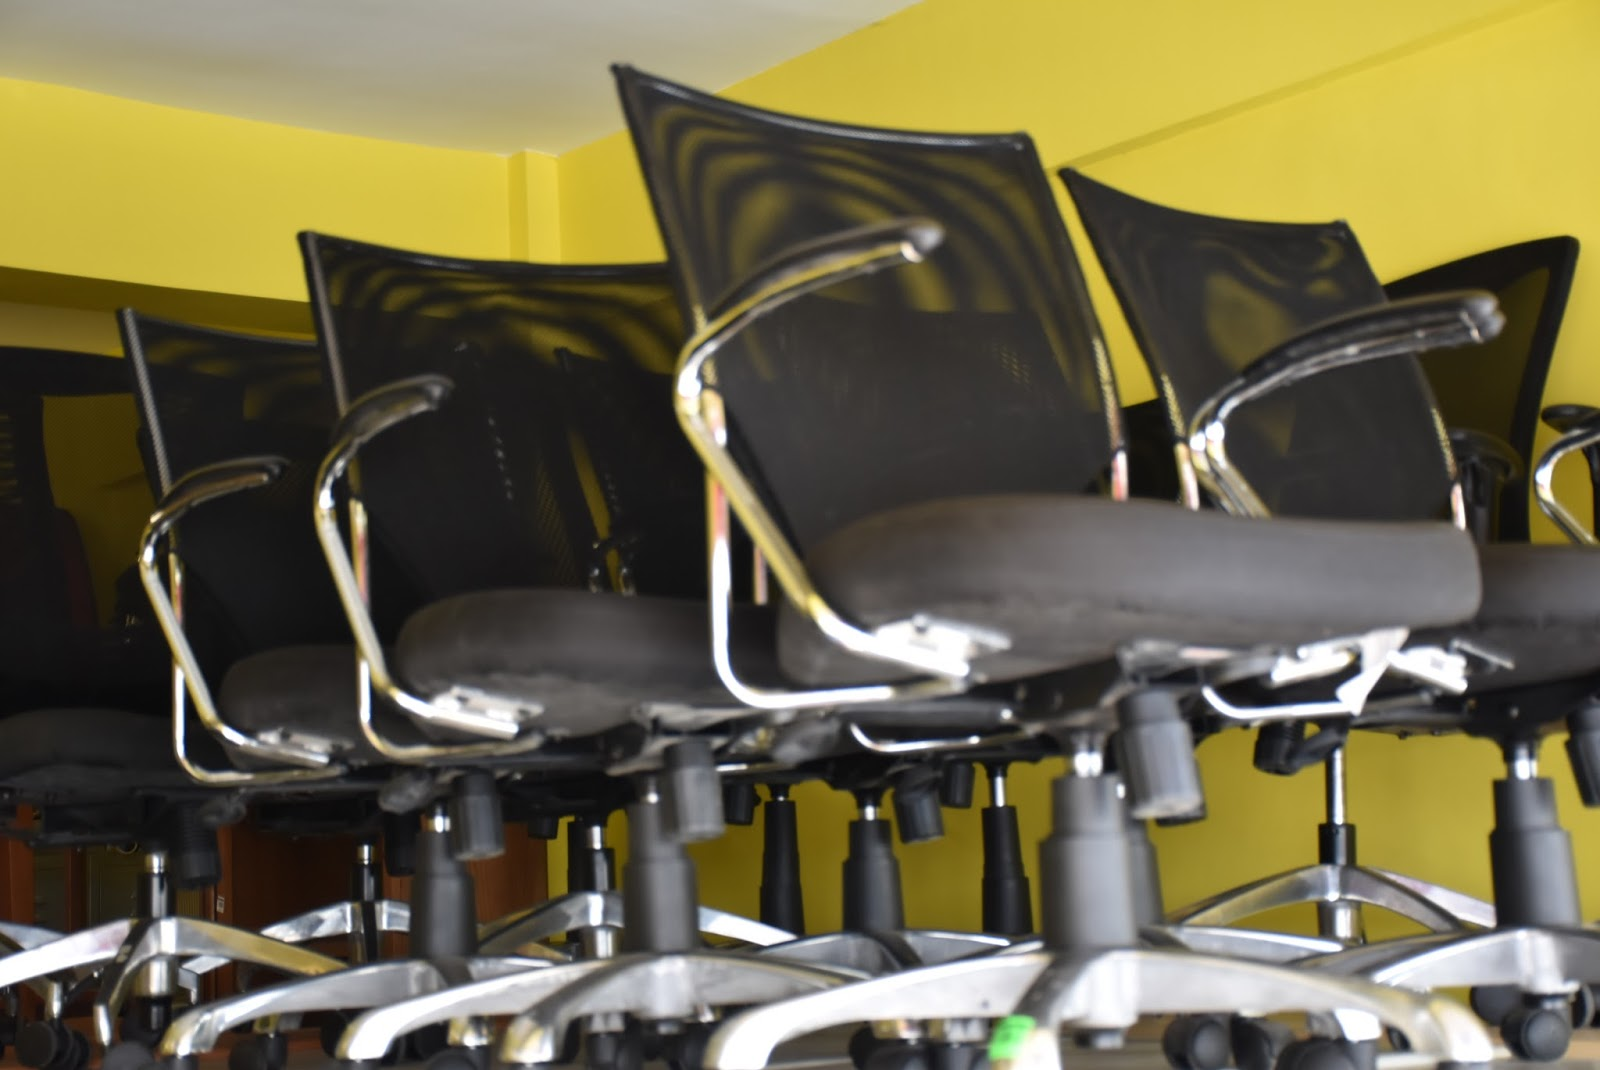 Premium Second Hand Office Furniture Supplier In Manila Megaoffice